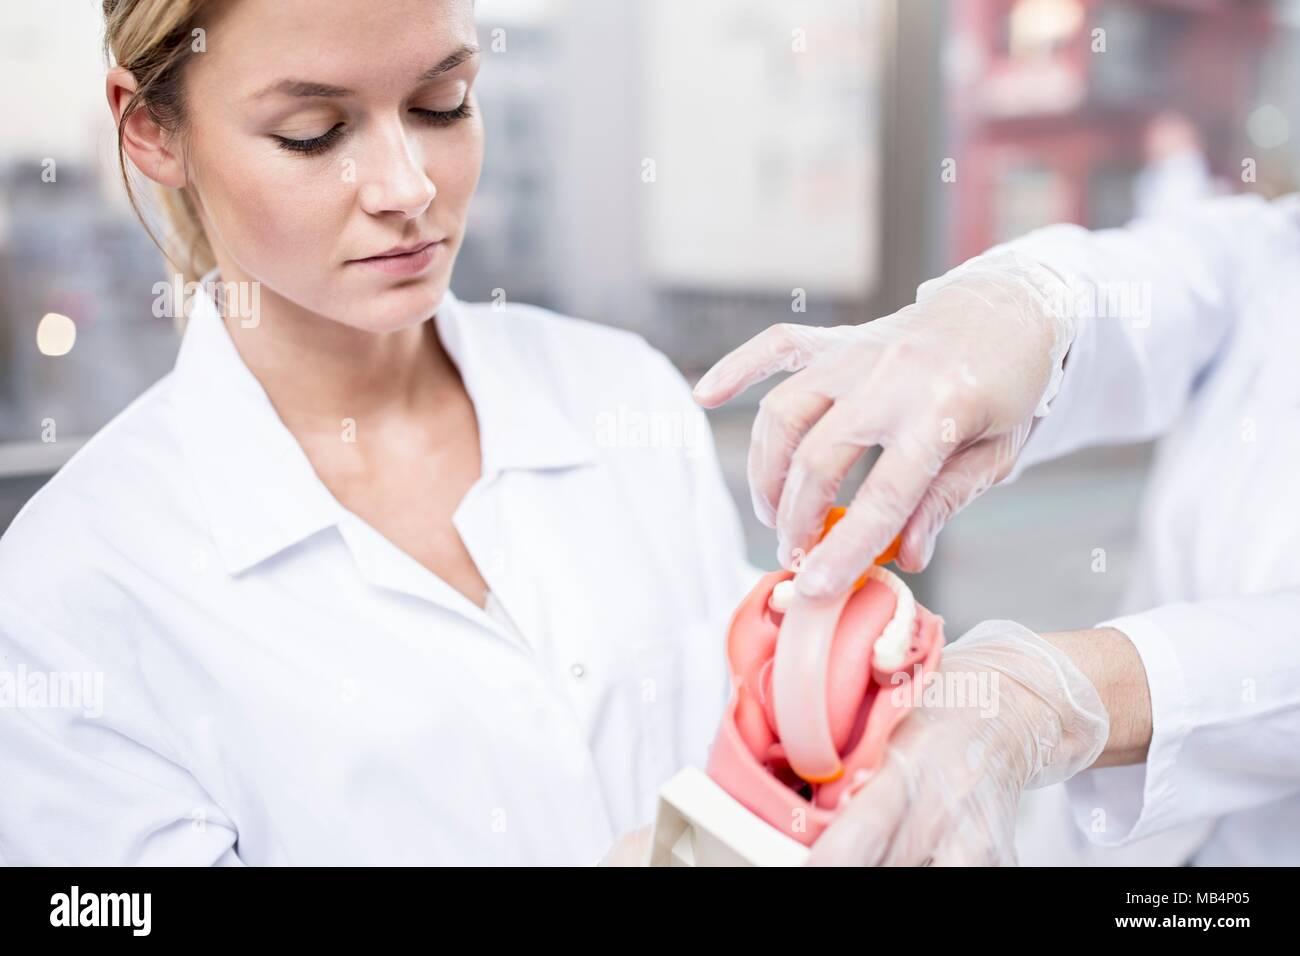 Teacher demonstrating tracheal intubation using a demonstration model. - Stock Image